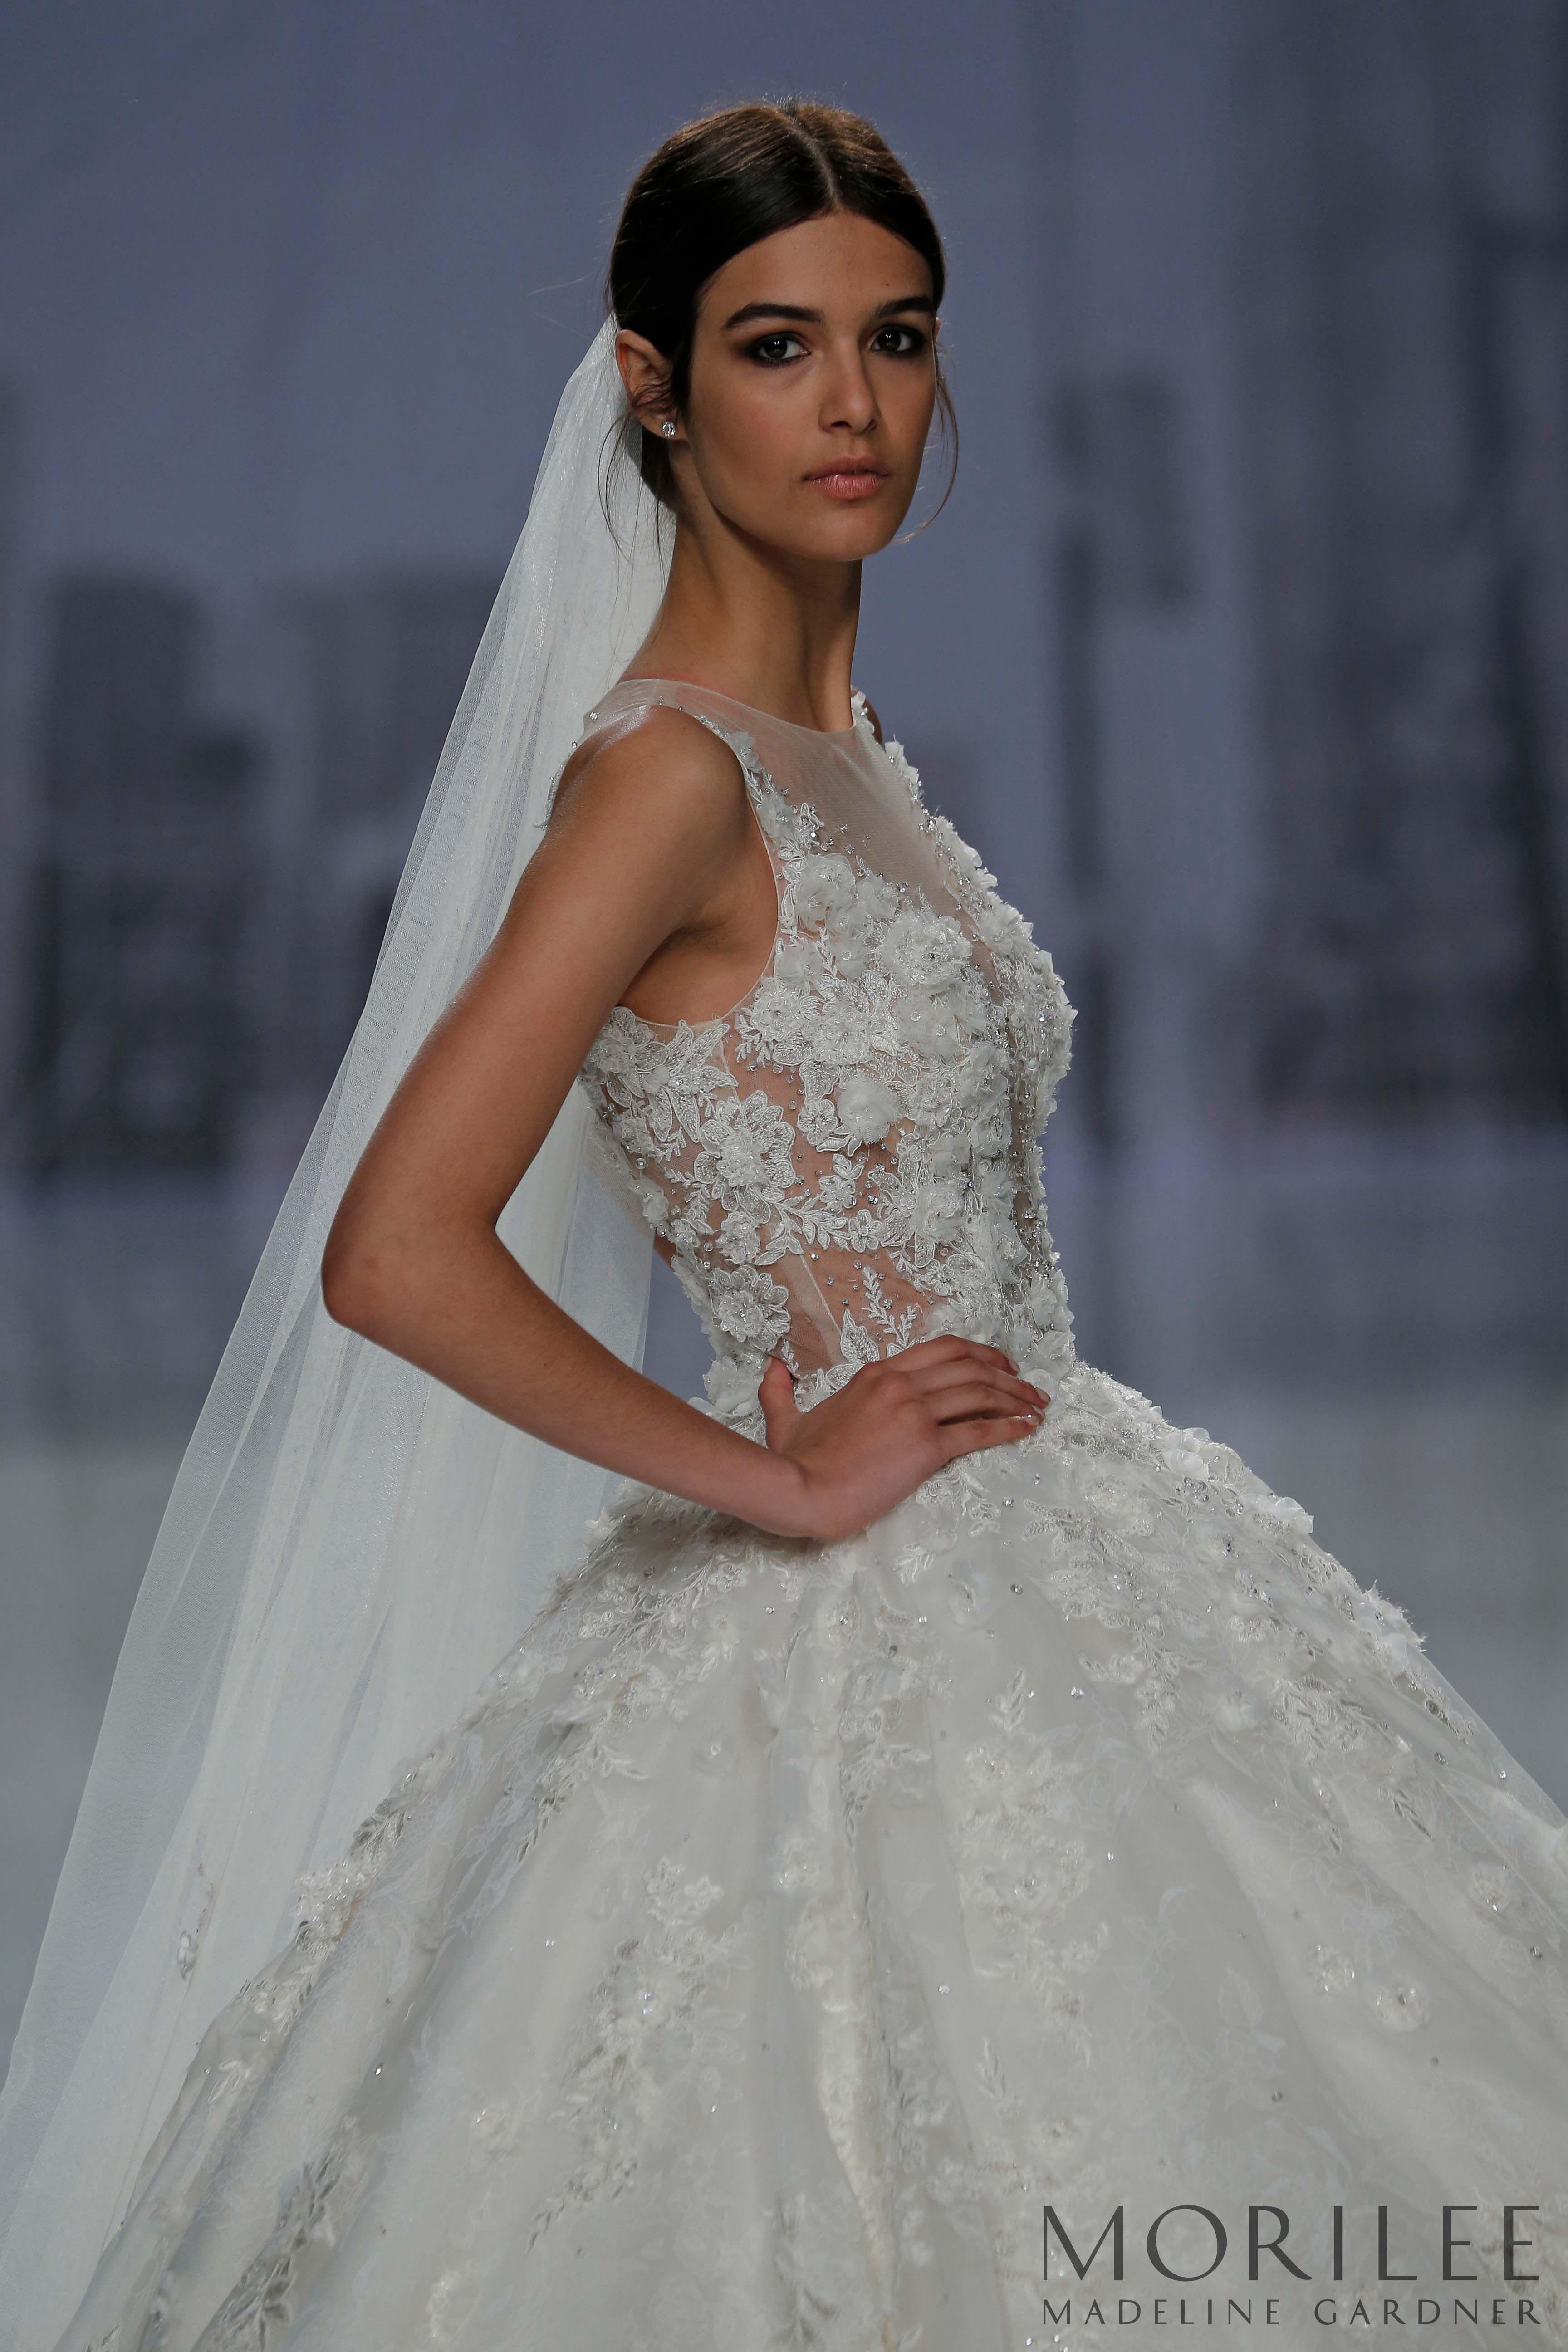 Morilee | Madeline Gardner, Maritza Wedding Dress. Walk into a ...